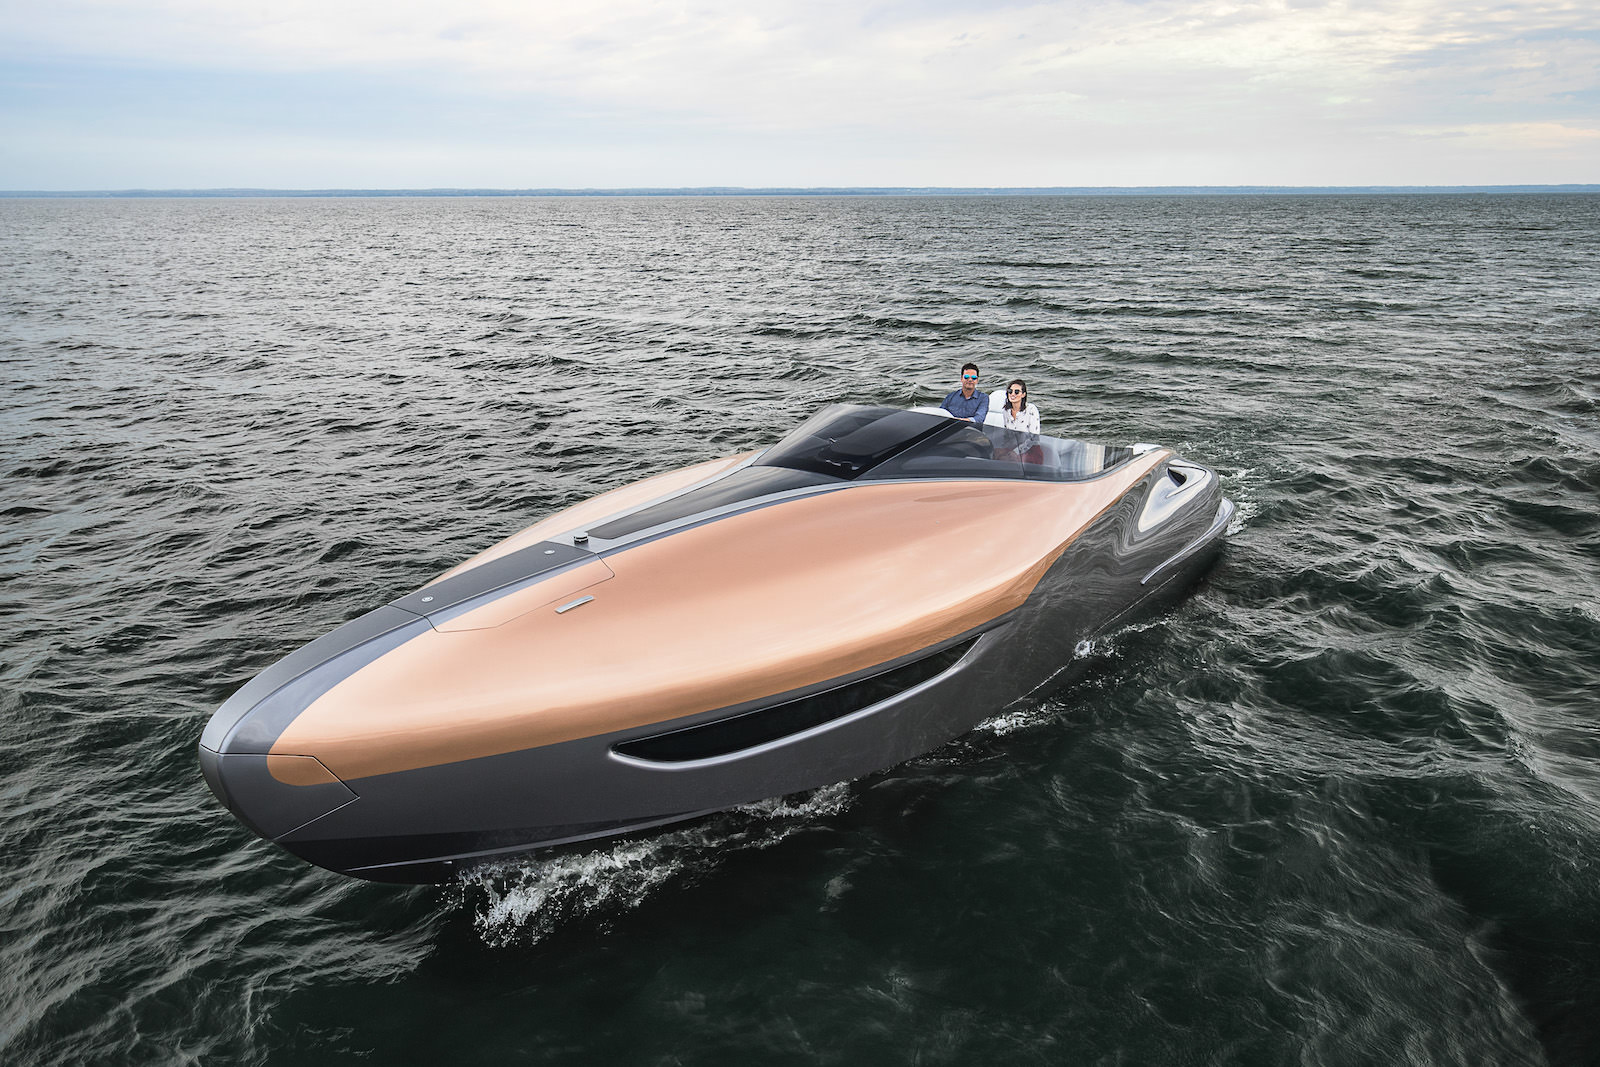 Lexus_Sport_Yacht_concept_5_85E6911F967396F557BAFE9D7DDA917ABBCB3DC8-1